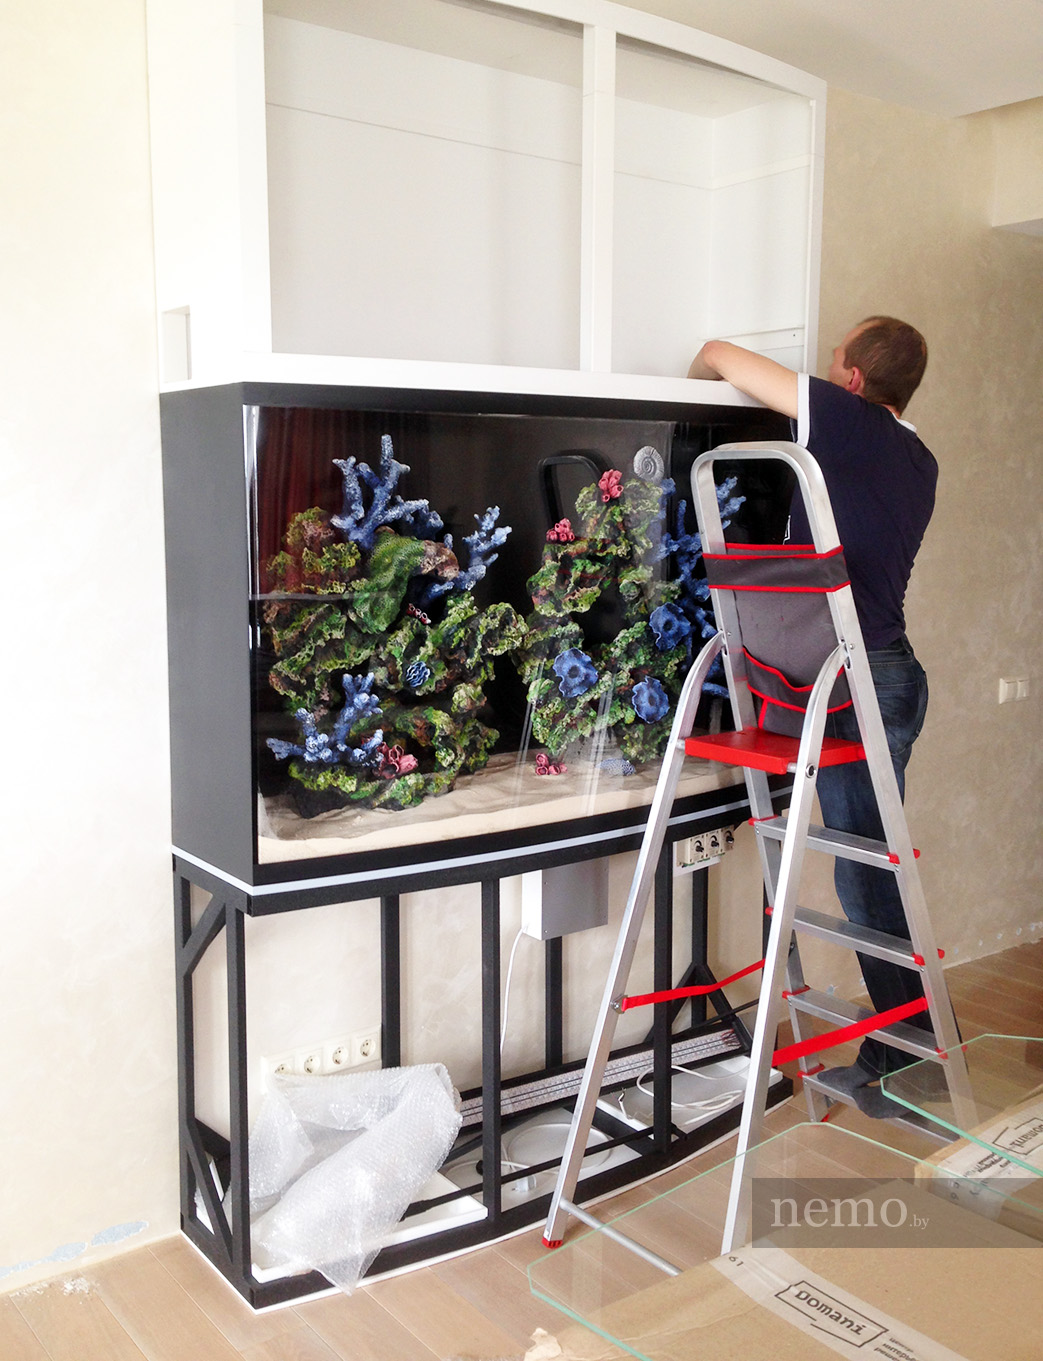 Установка аквариума до зашивки мебелью